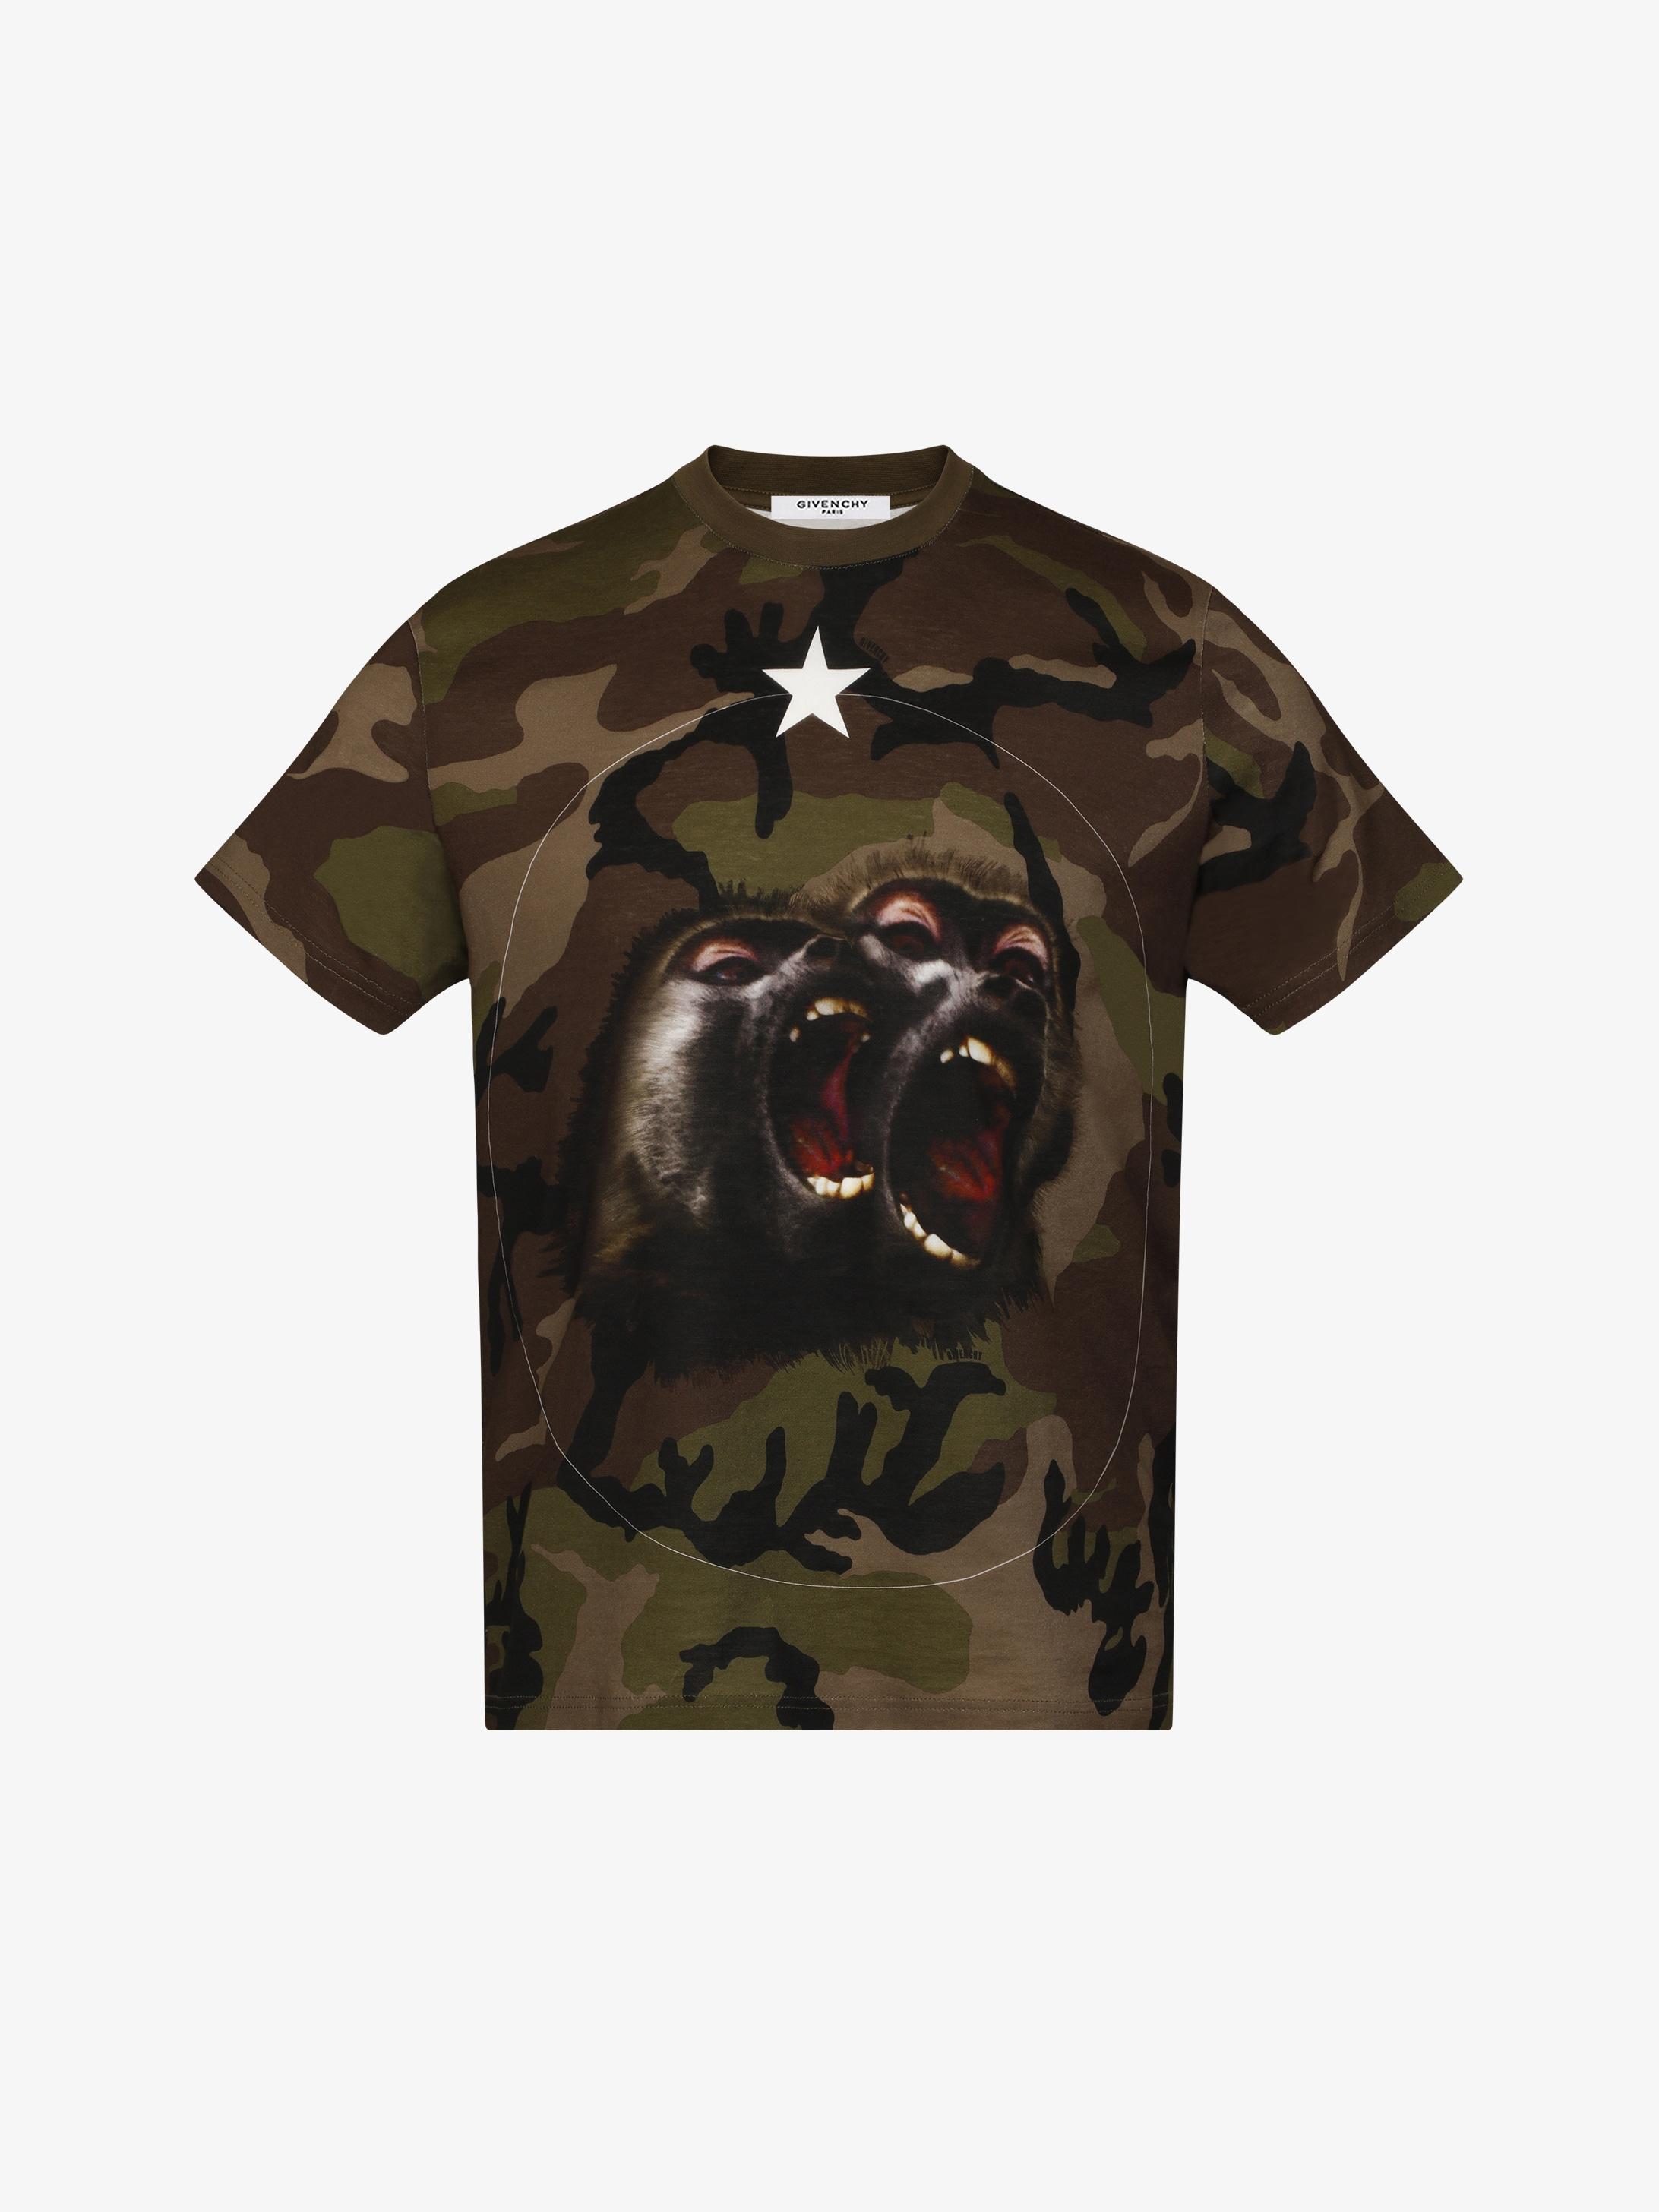 Camo printed t-shirt